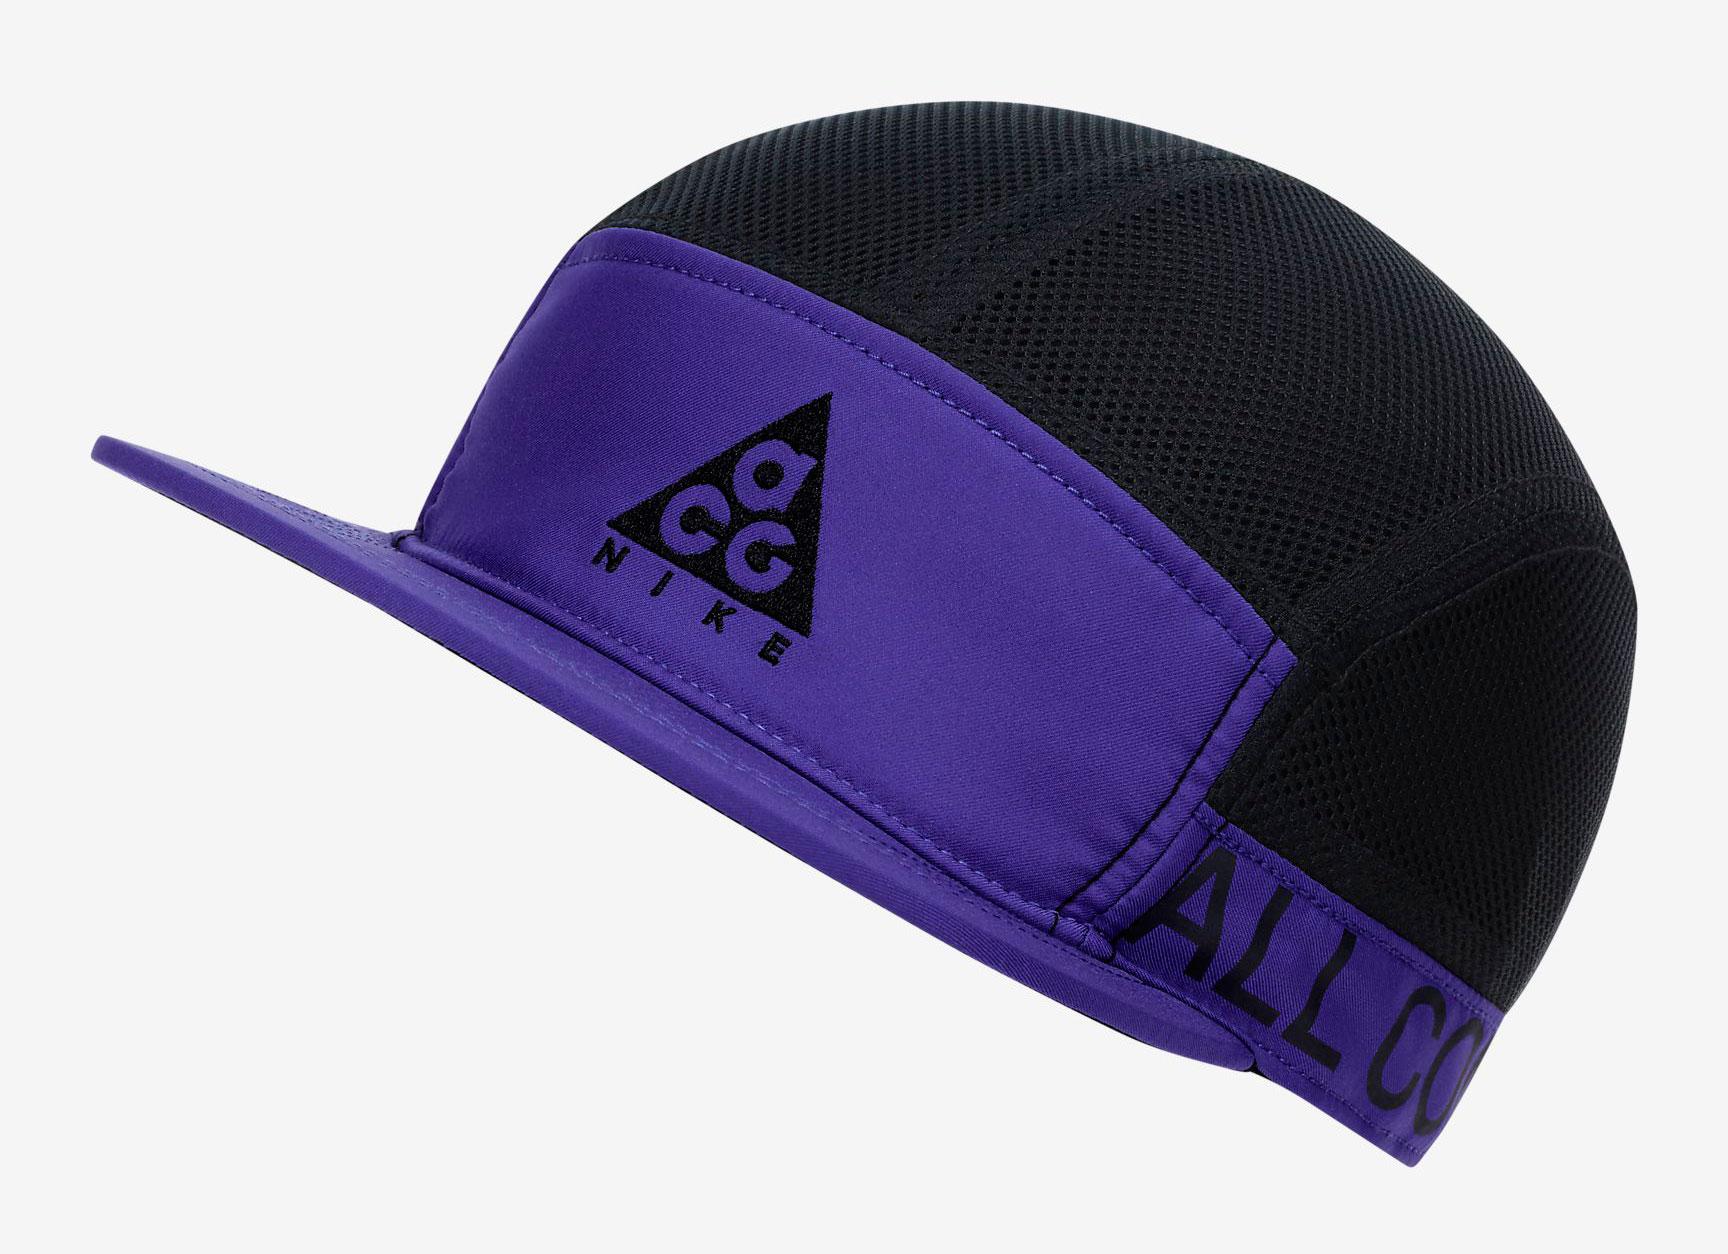 nike-acg-hat-purple-black-1